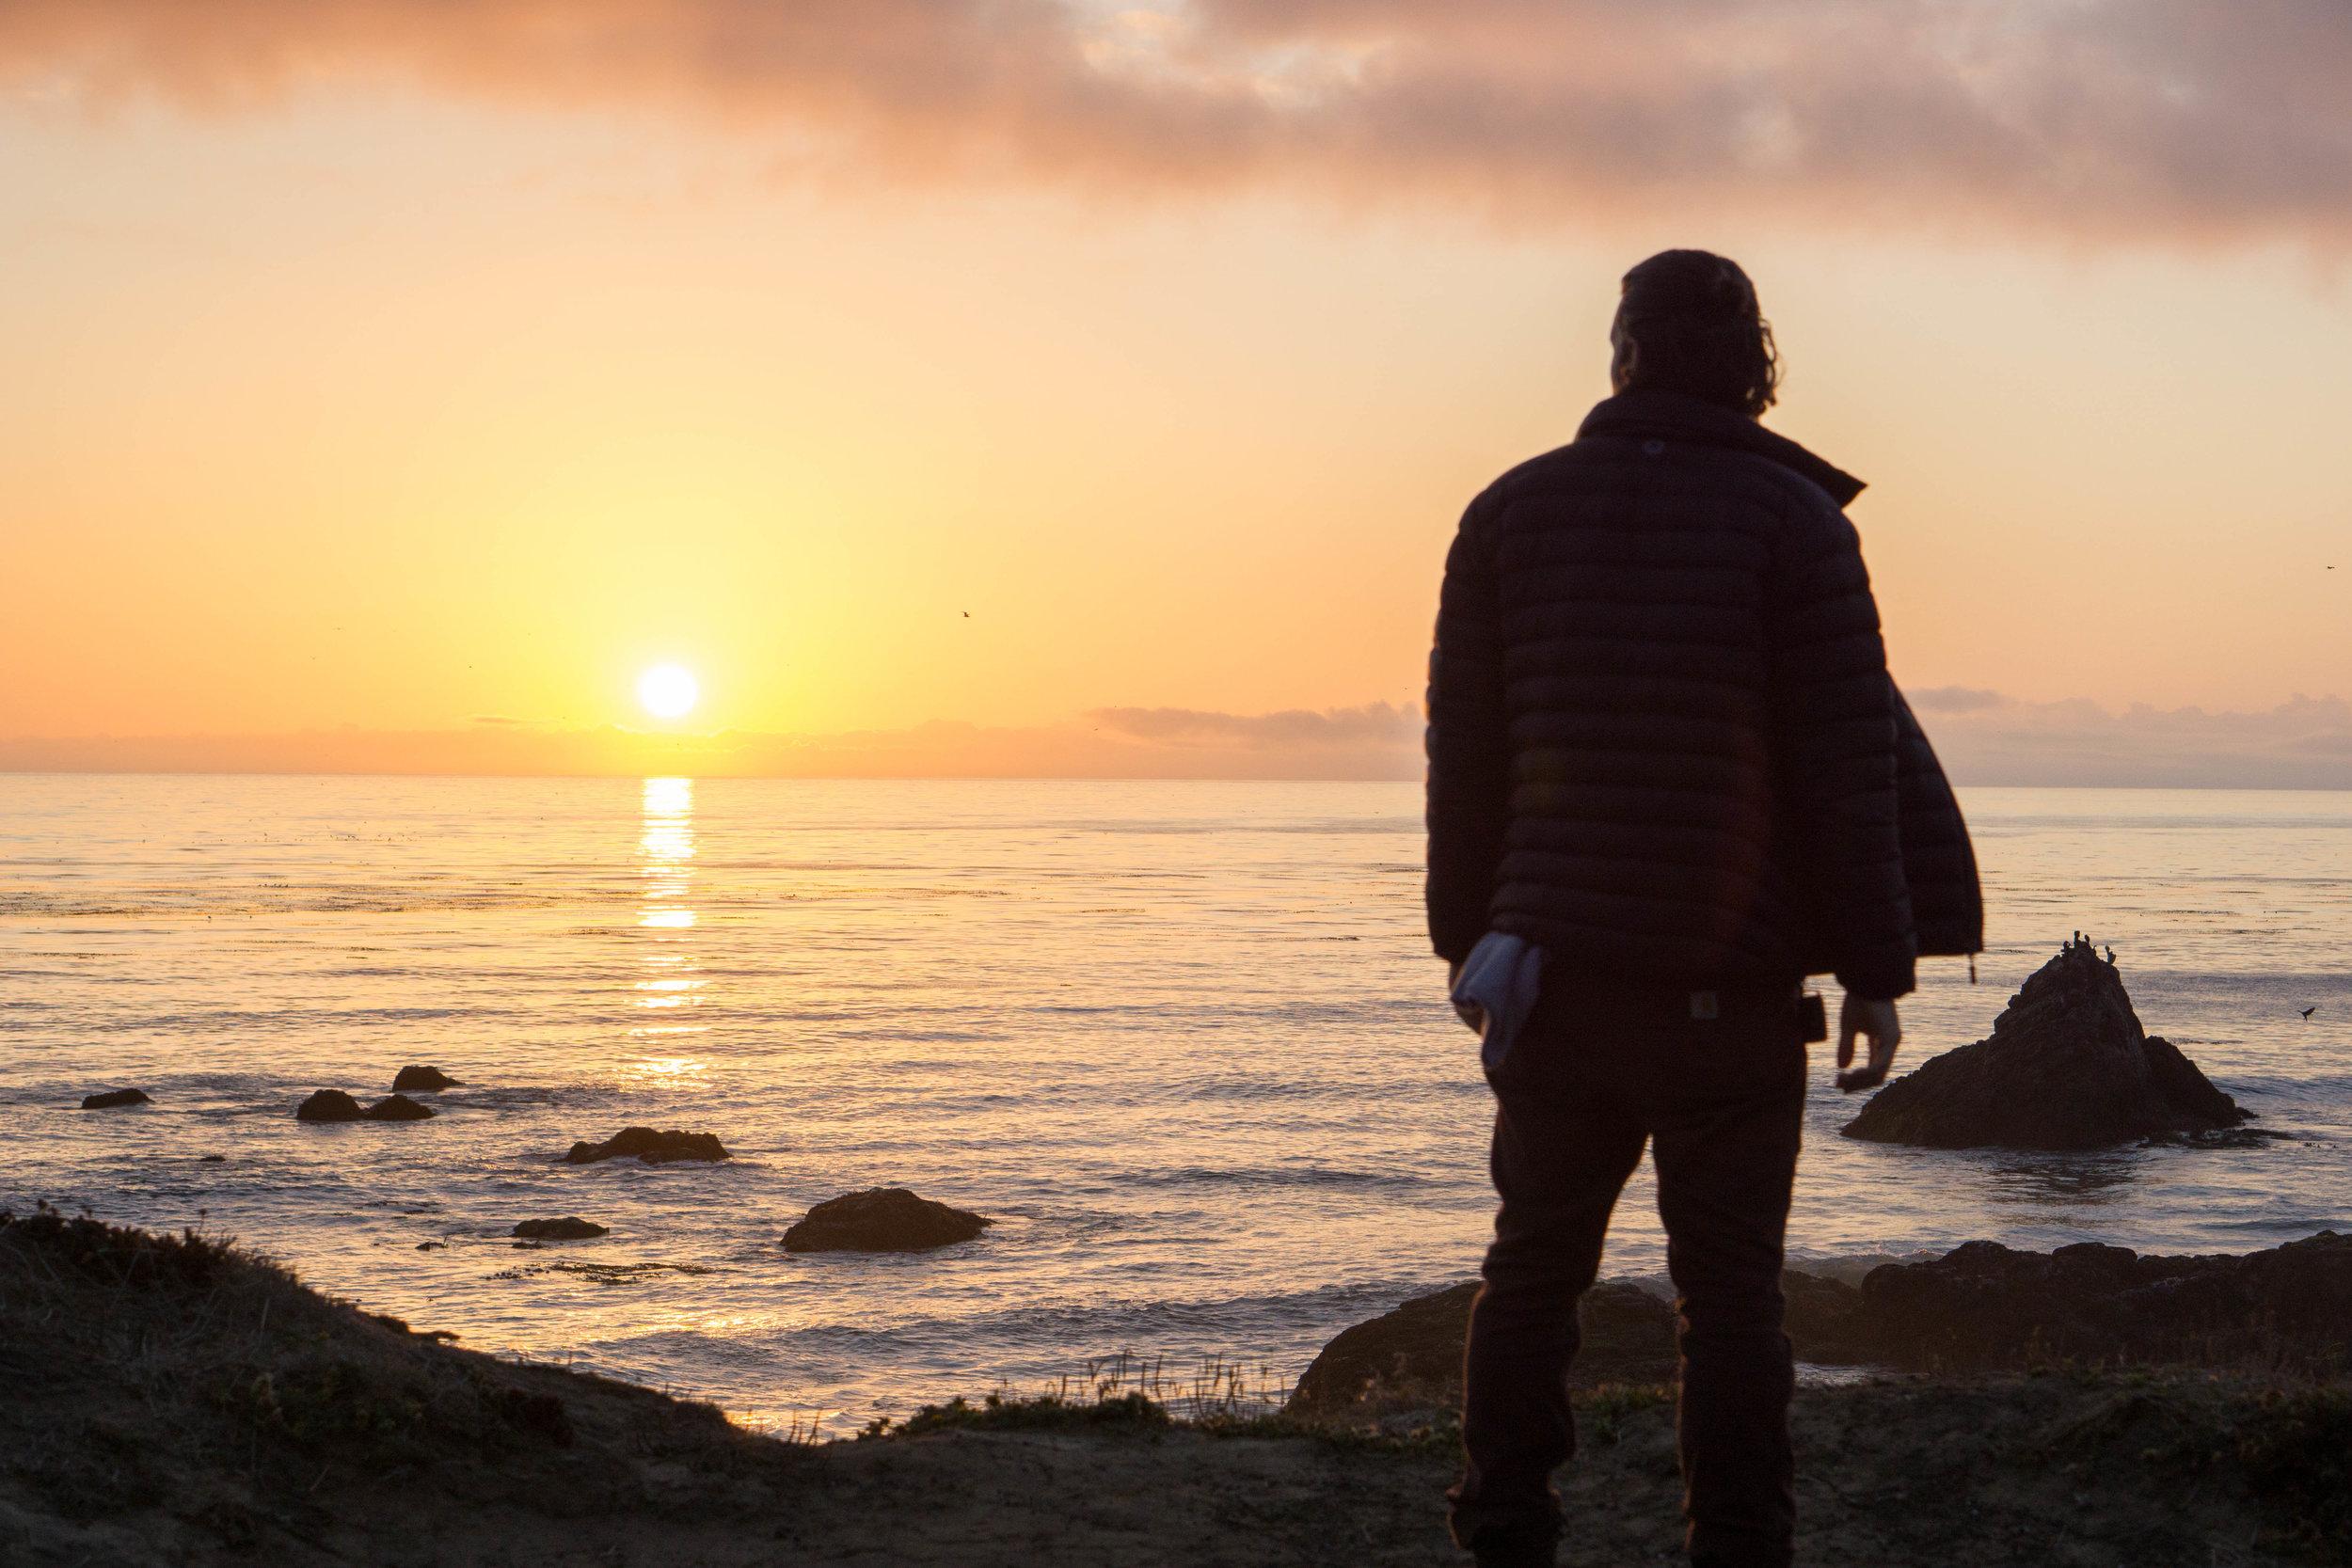 alex sunset san simeon 40 hours of freedom